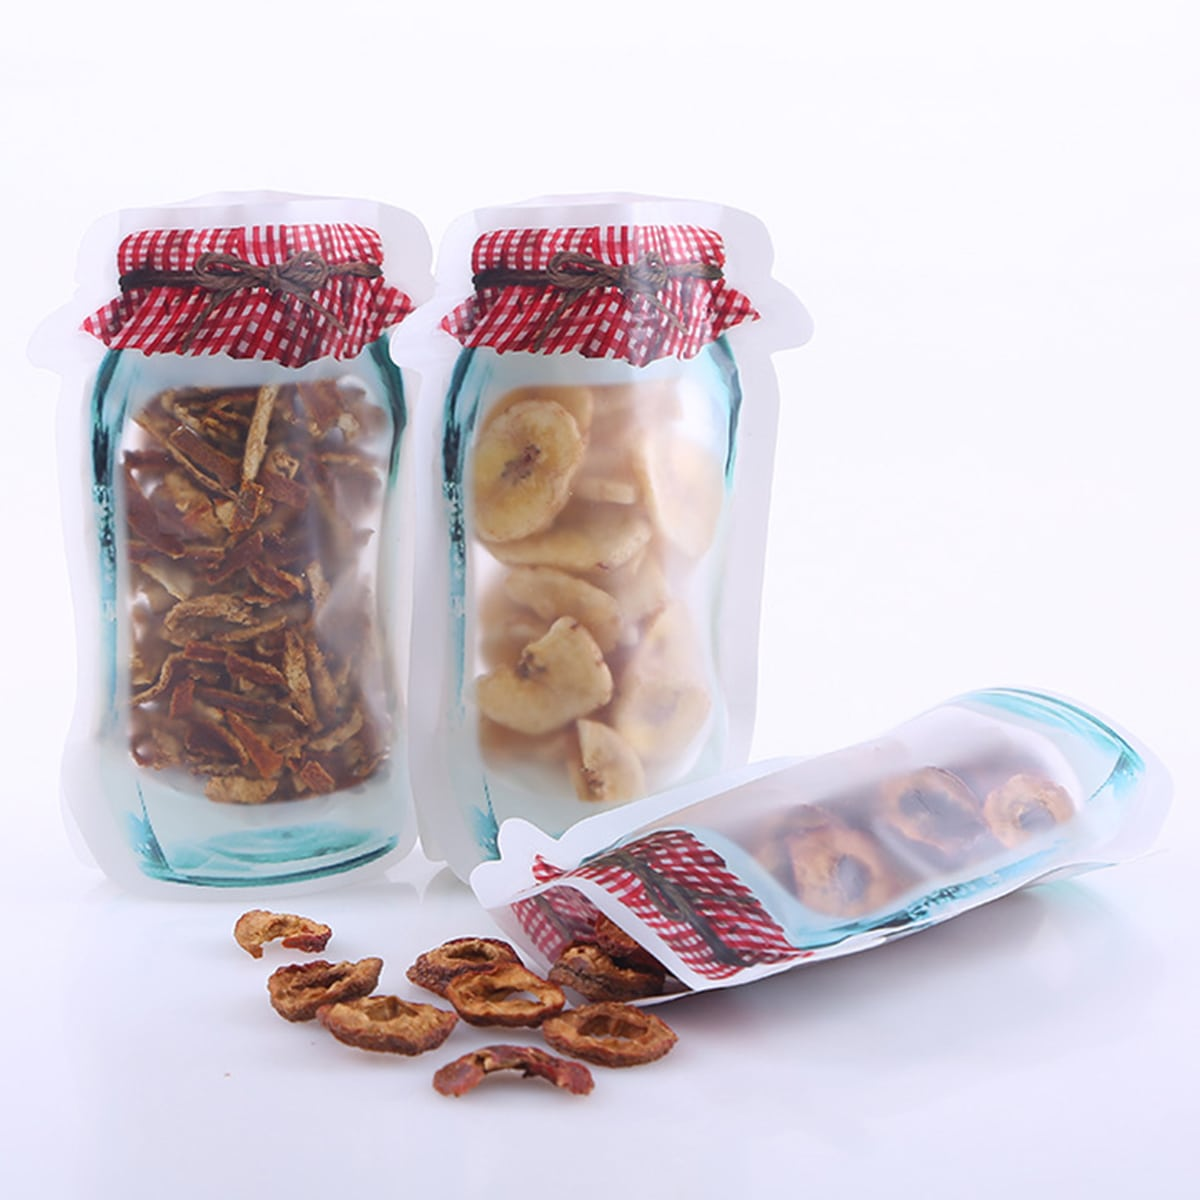 SHEIN / 10pcs Food Ziplock Bag